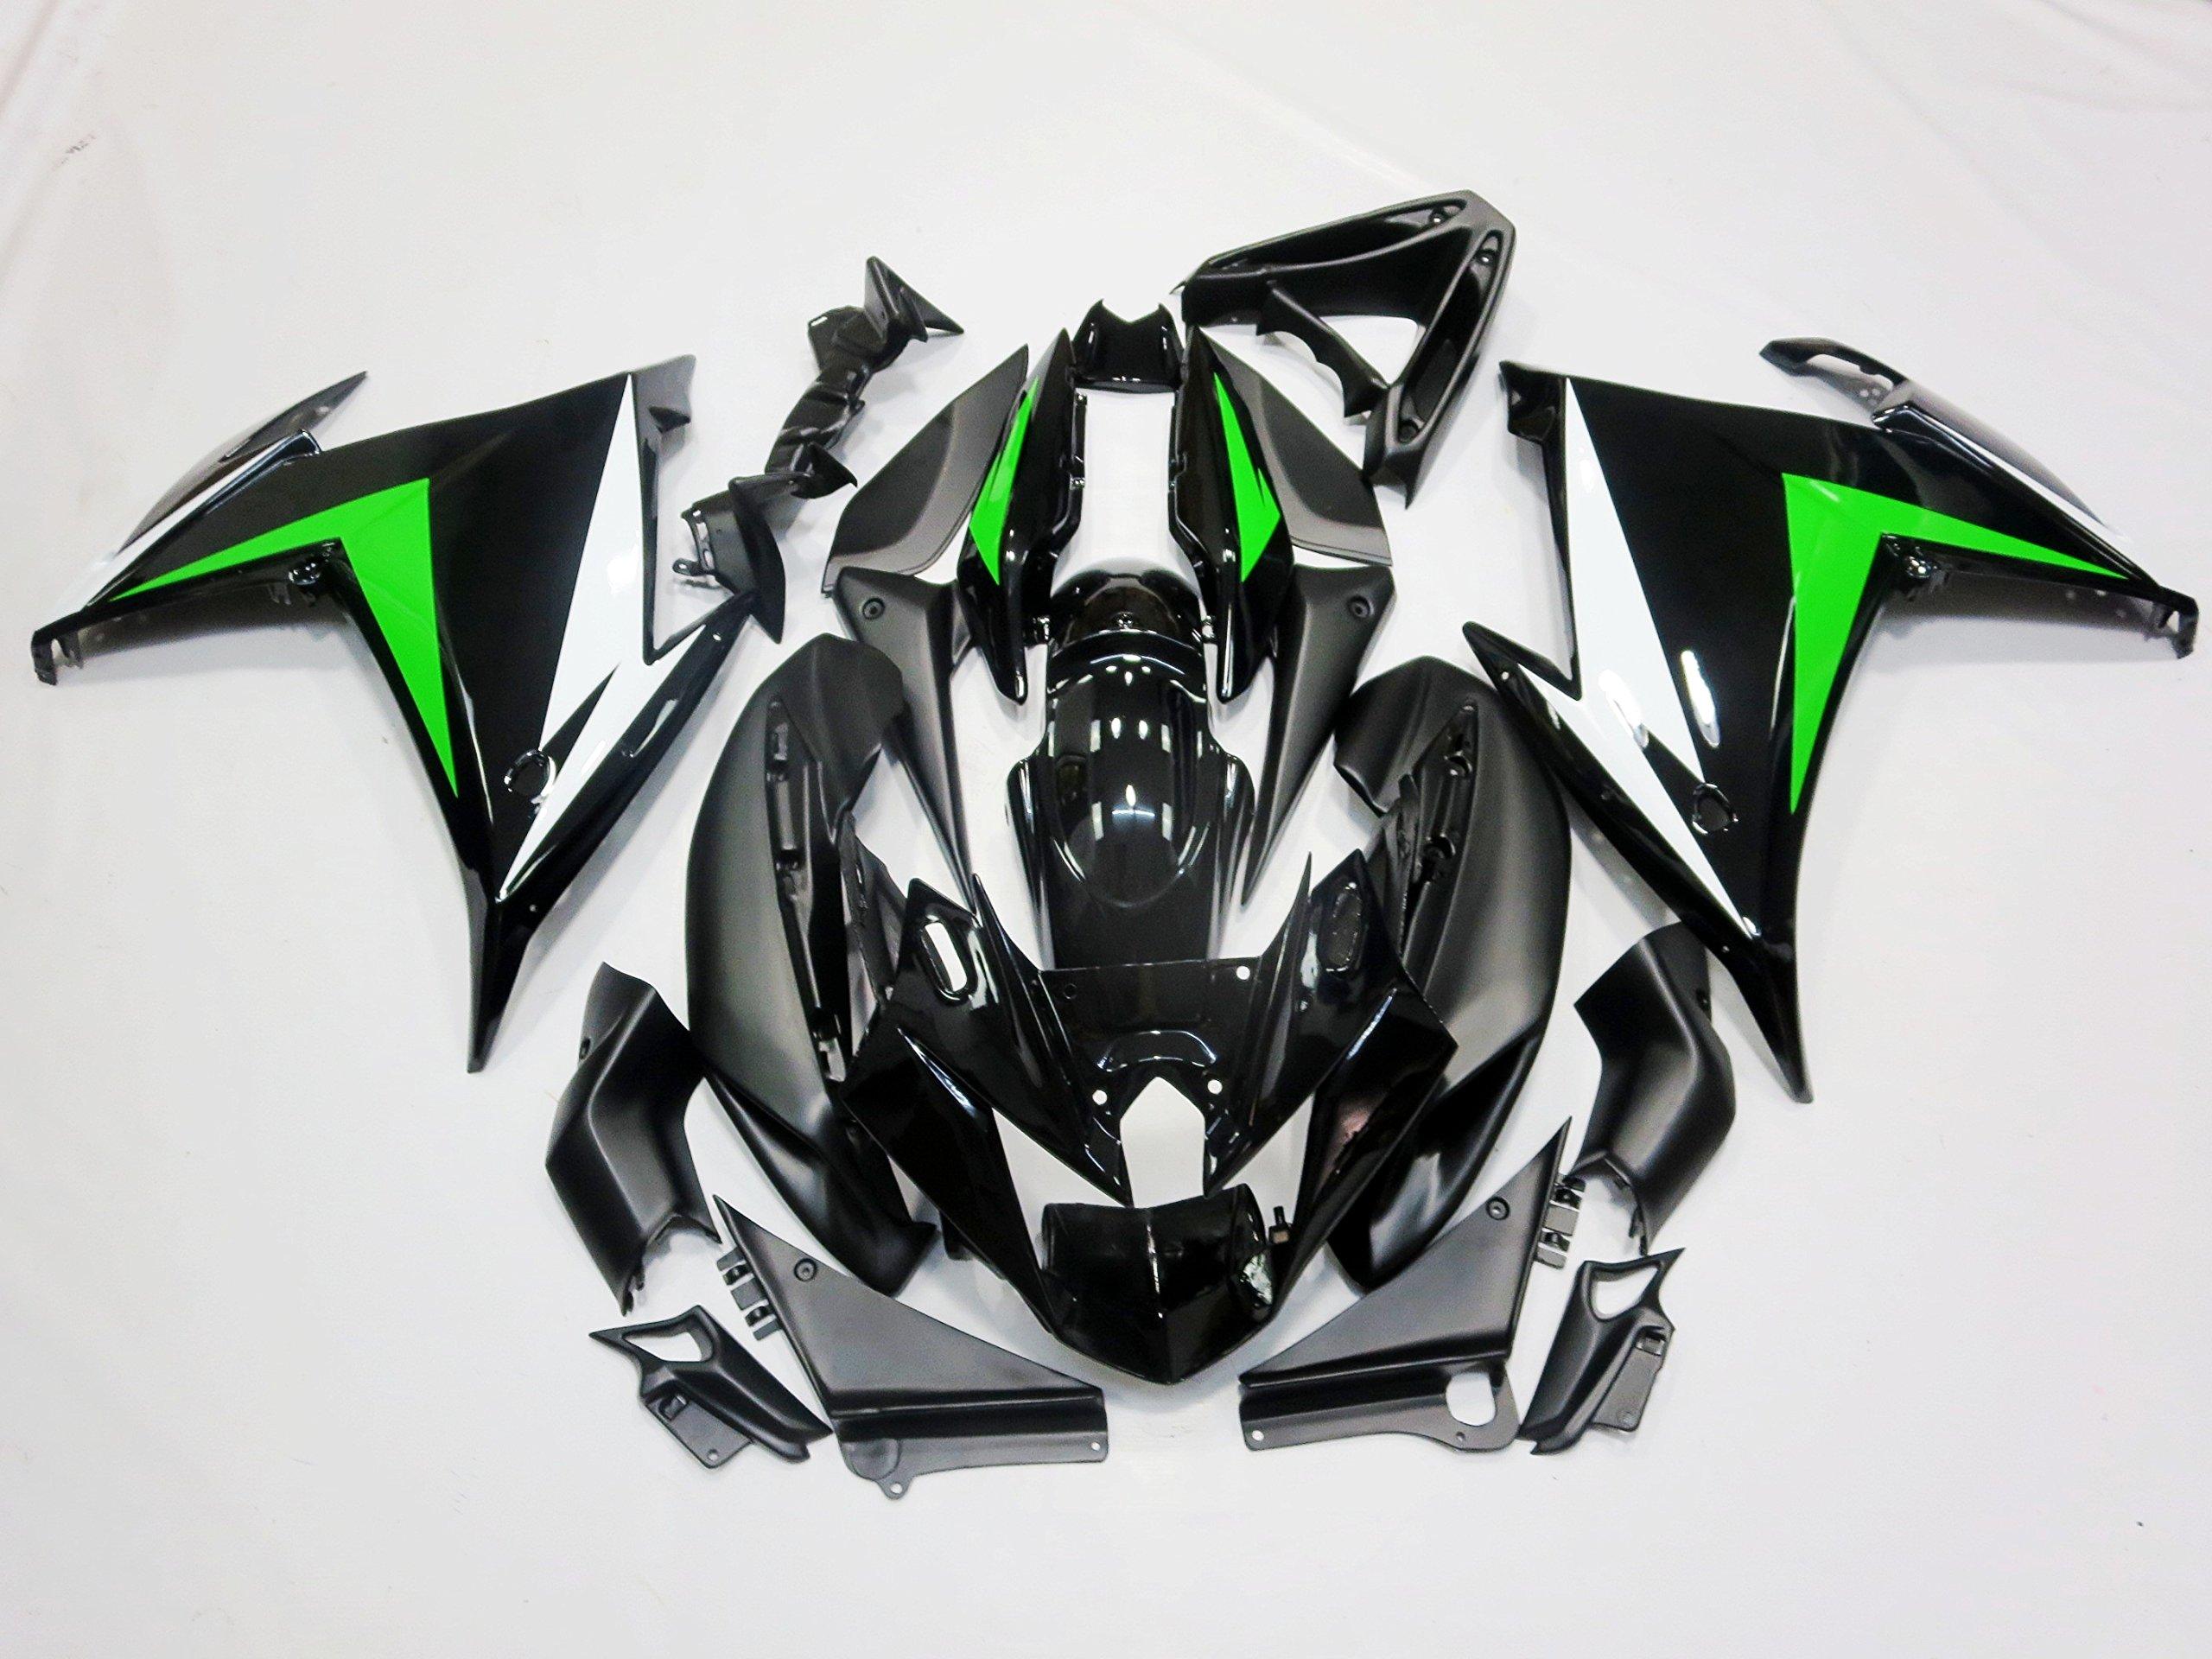 Damiya Motorcycle Fairings for Yamaha FZ6R 2009-2010 Black